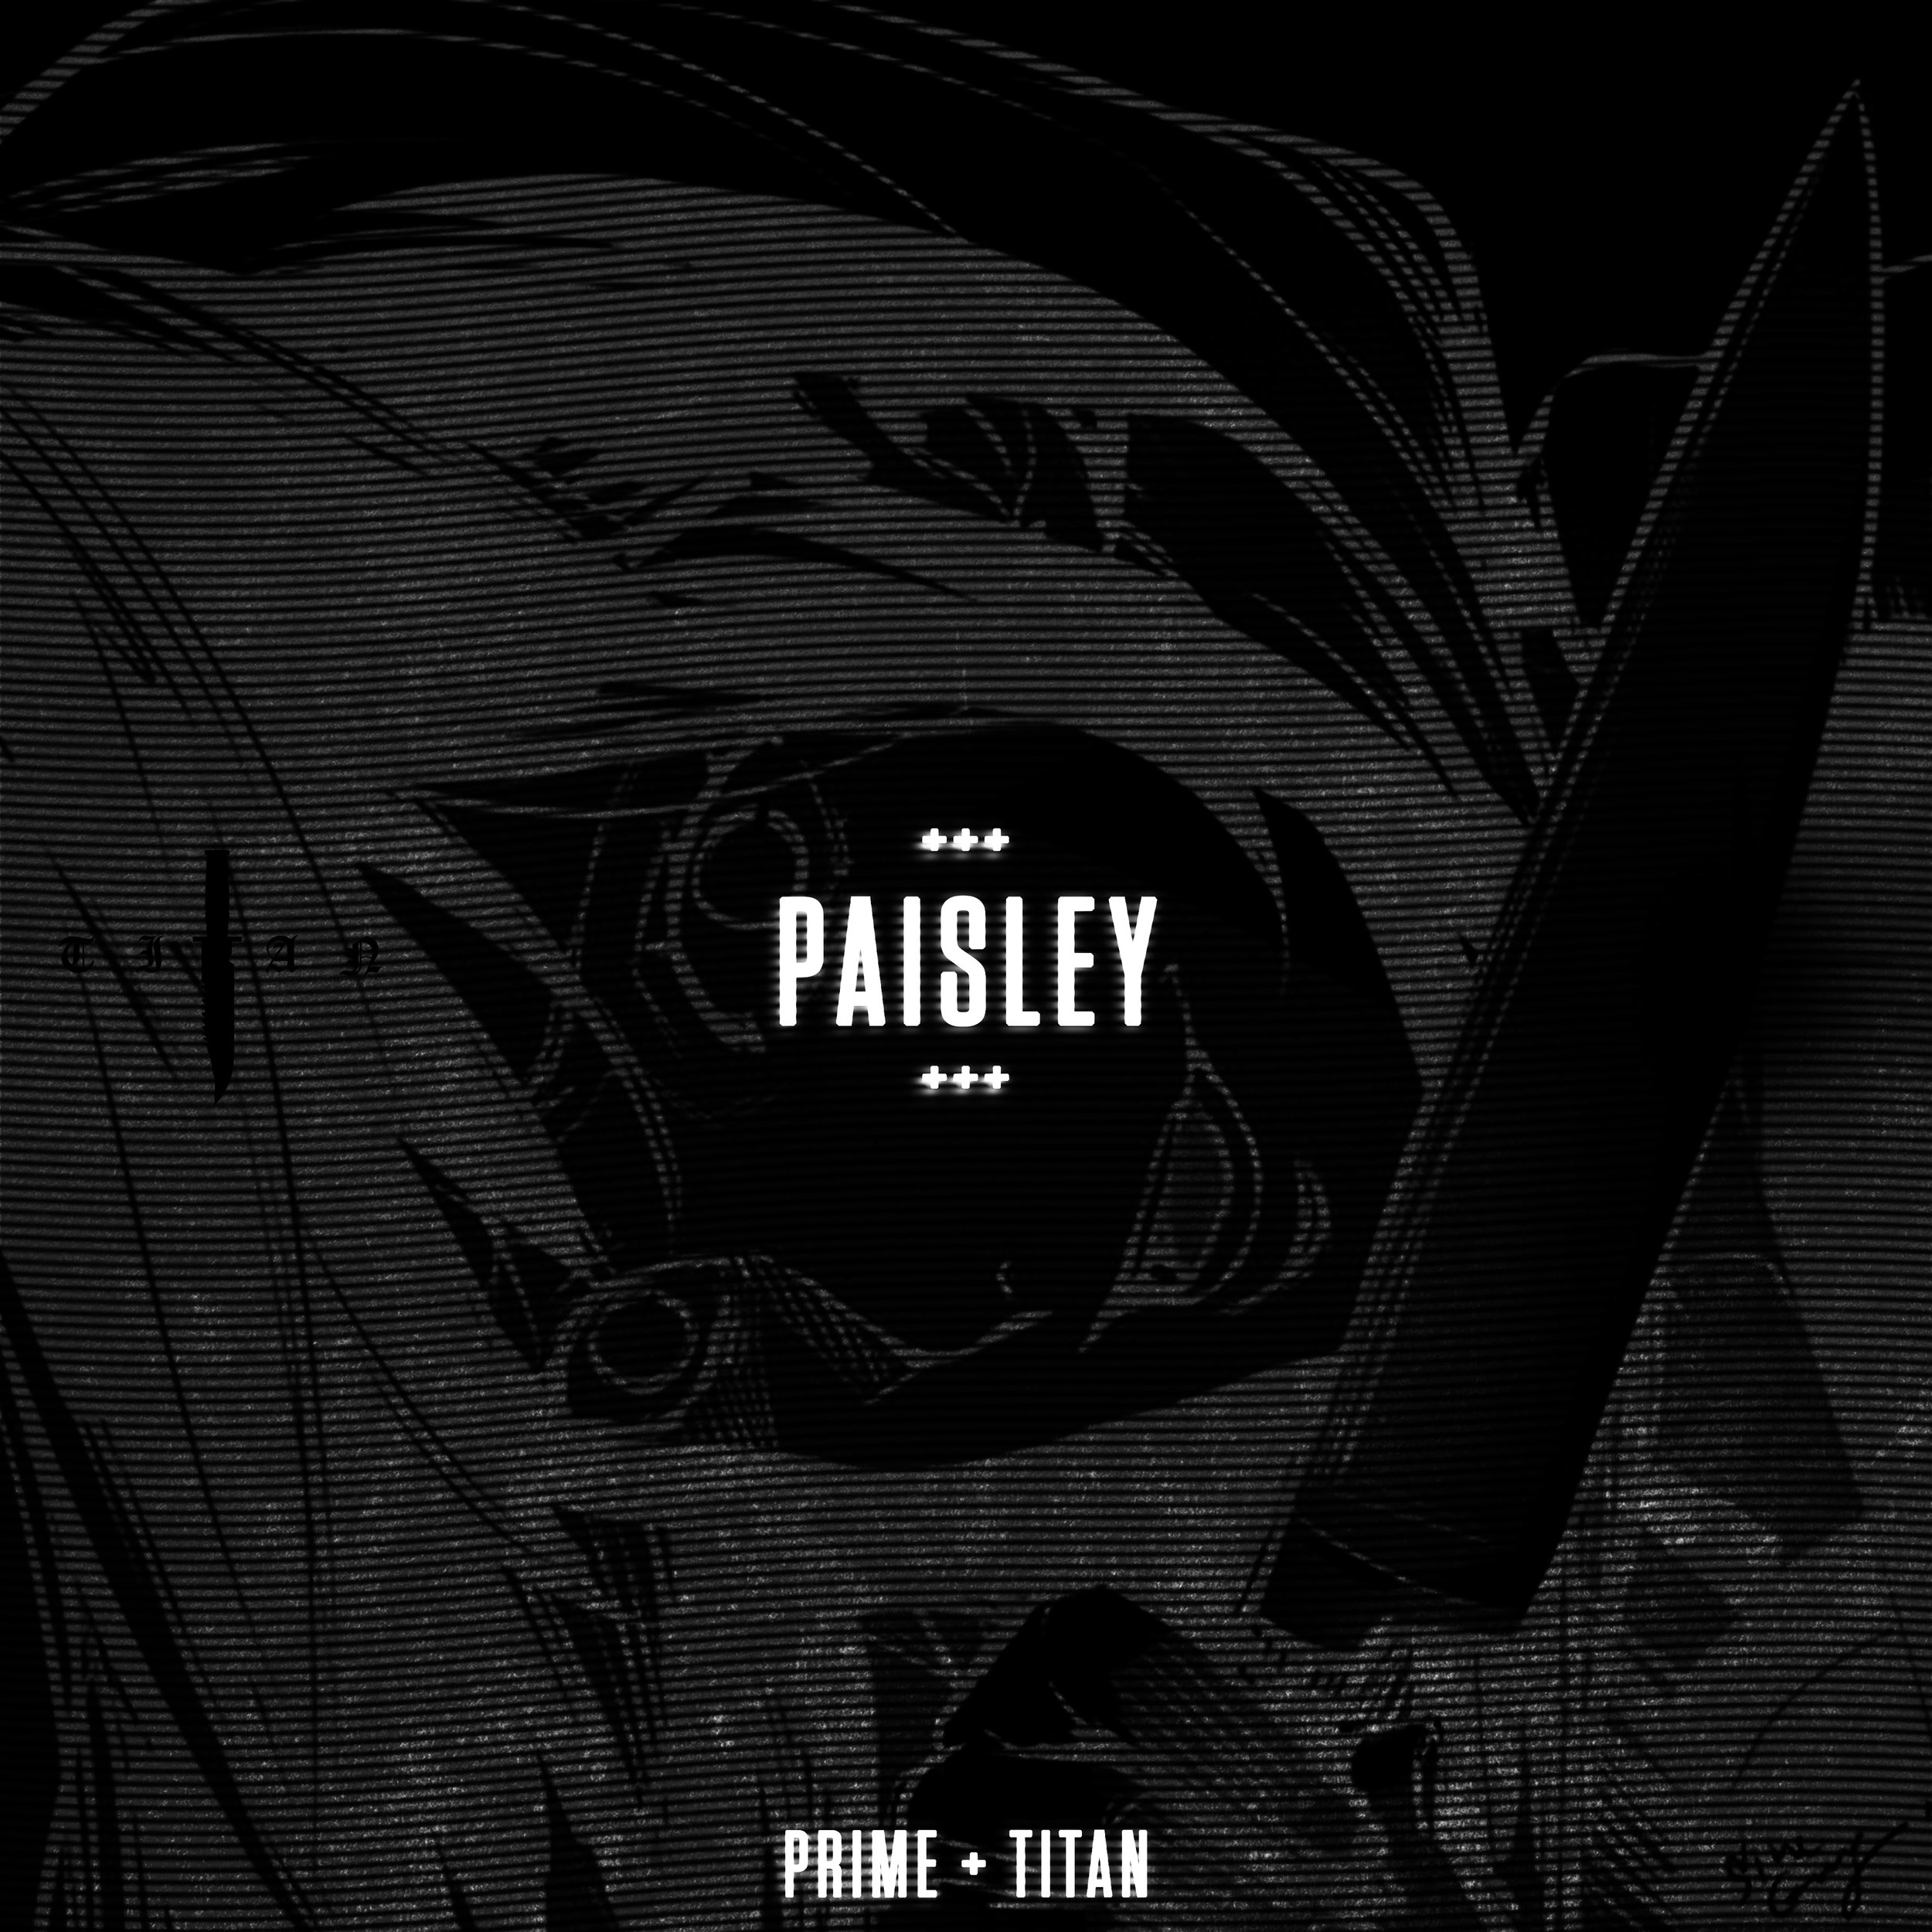 paisley-artwork.jpg